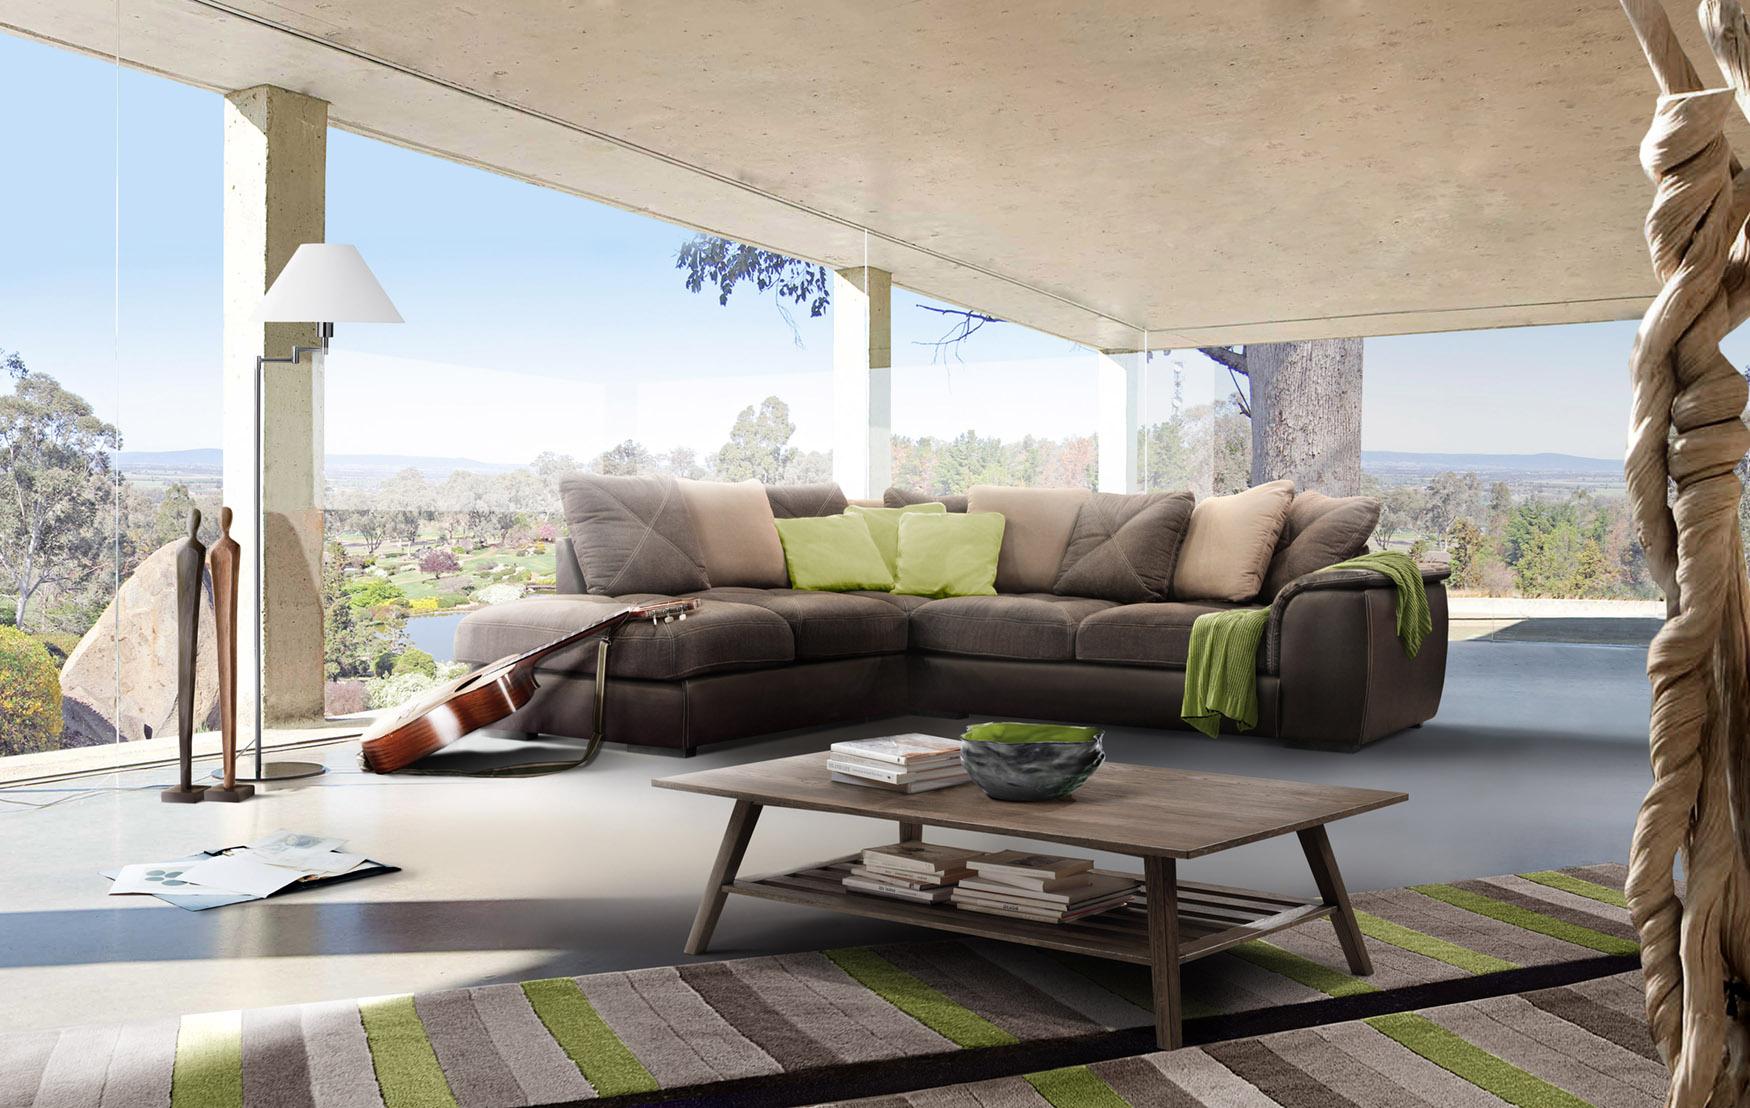 canape mobilier de france nebraska meubles sicot - Canape Mobilier De France